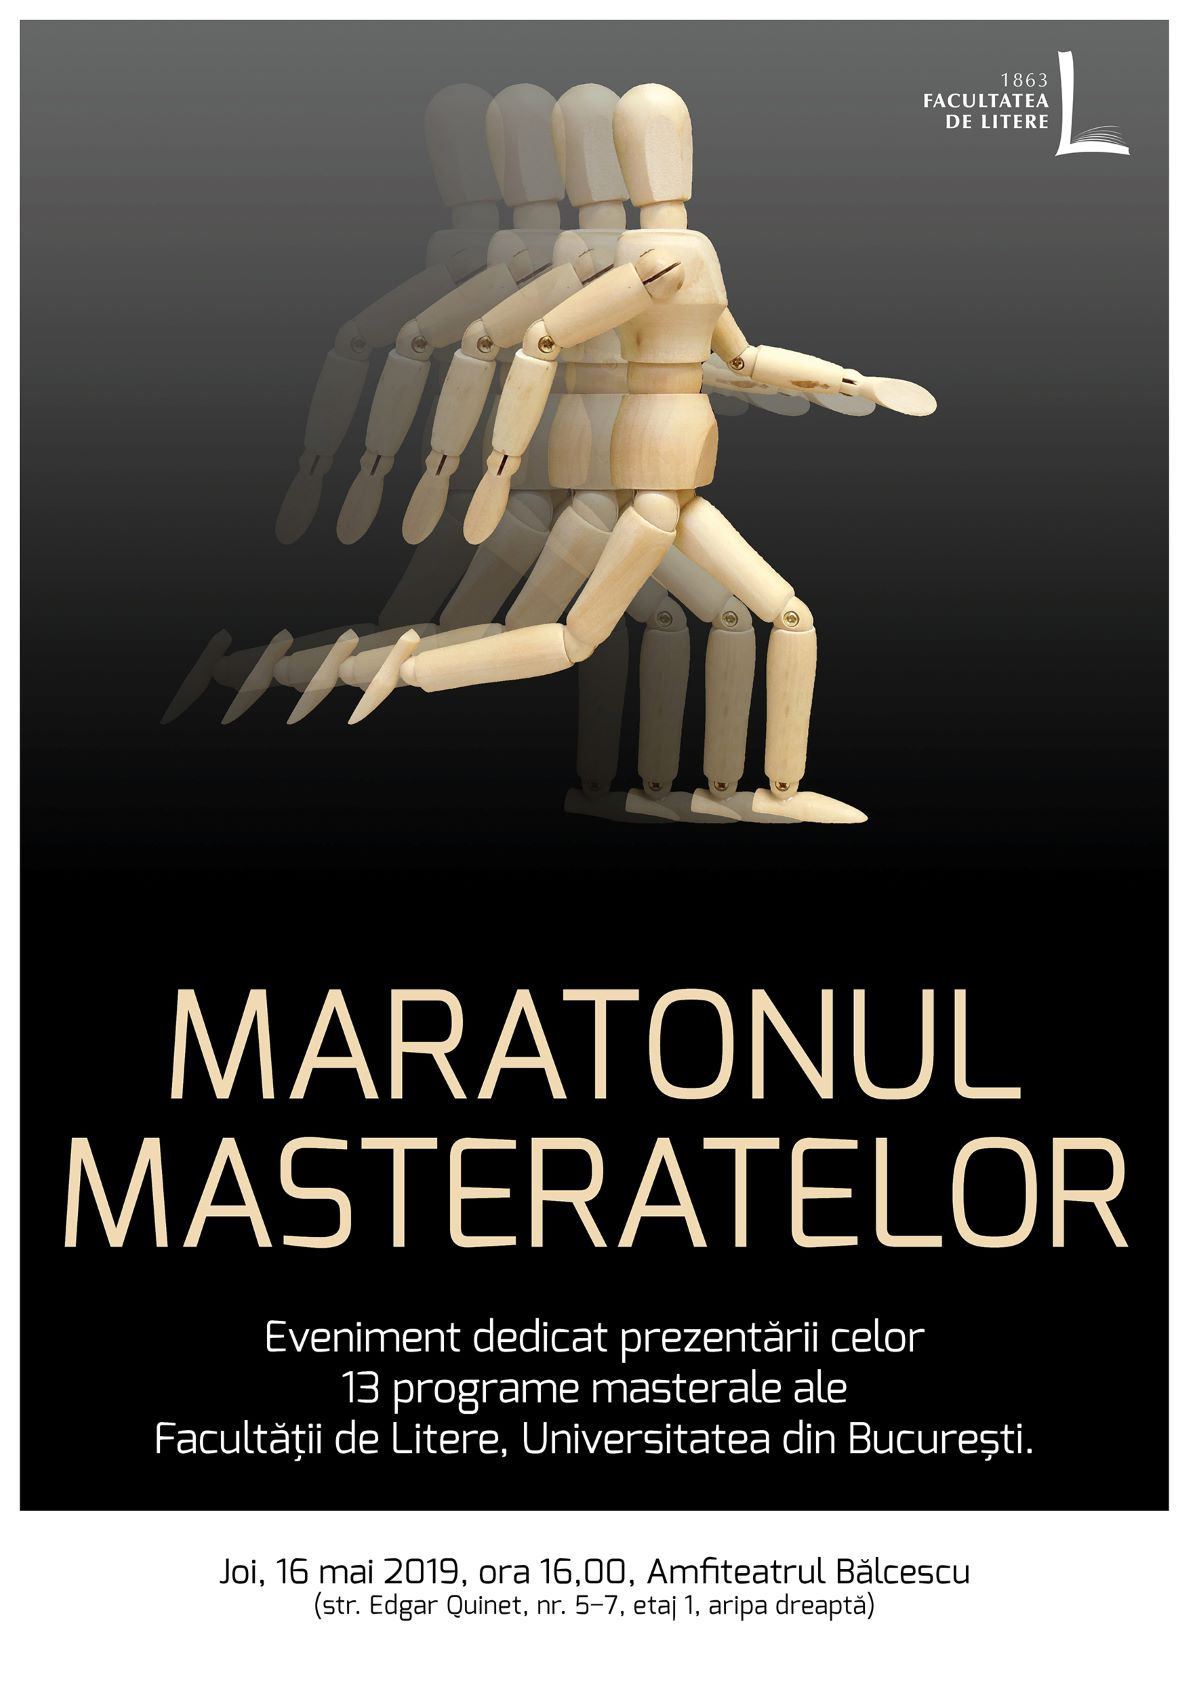 Maratonul Masteratelor 2019